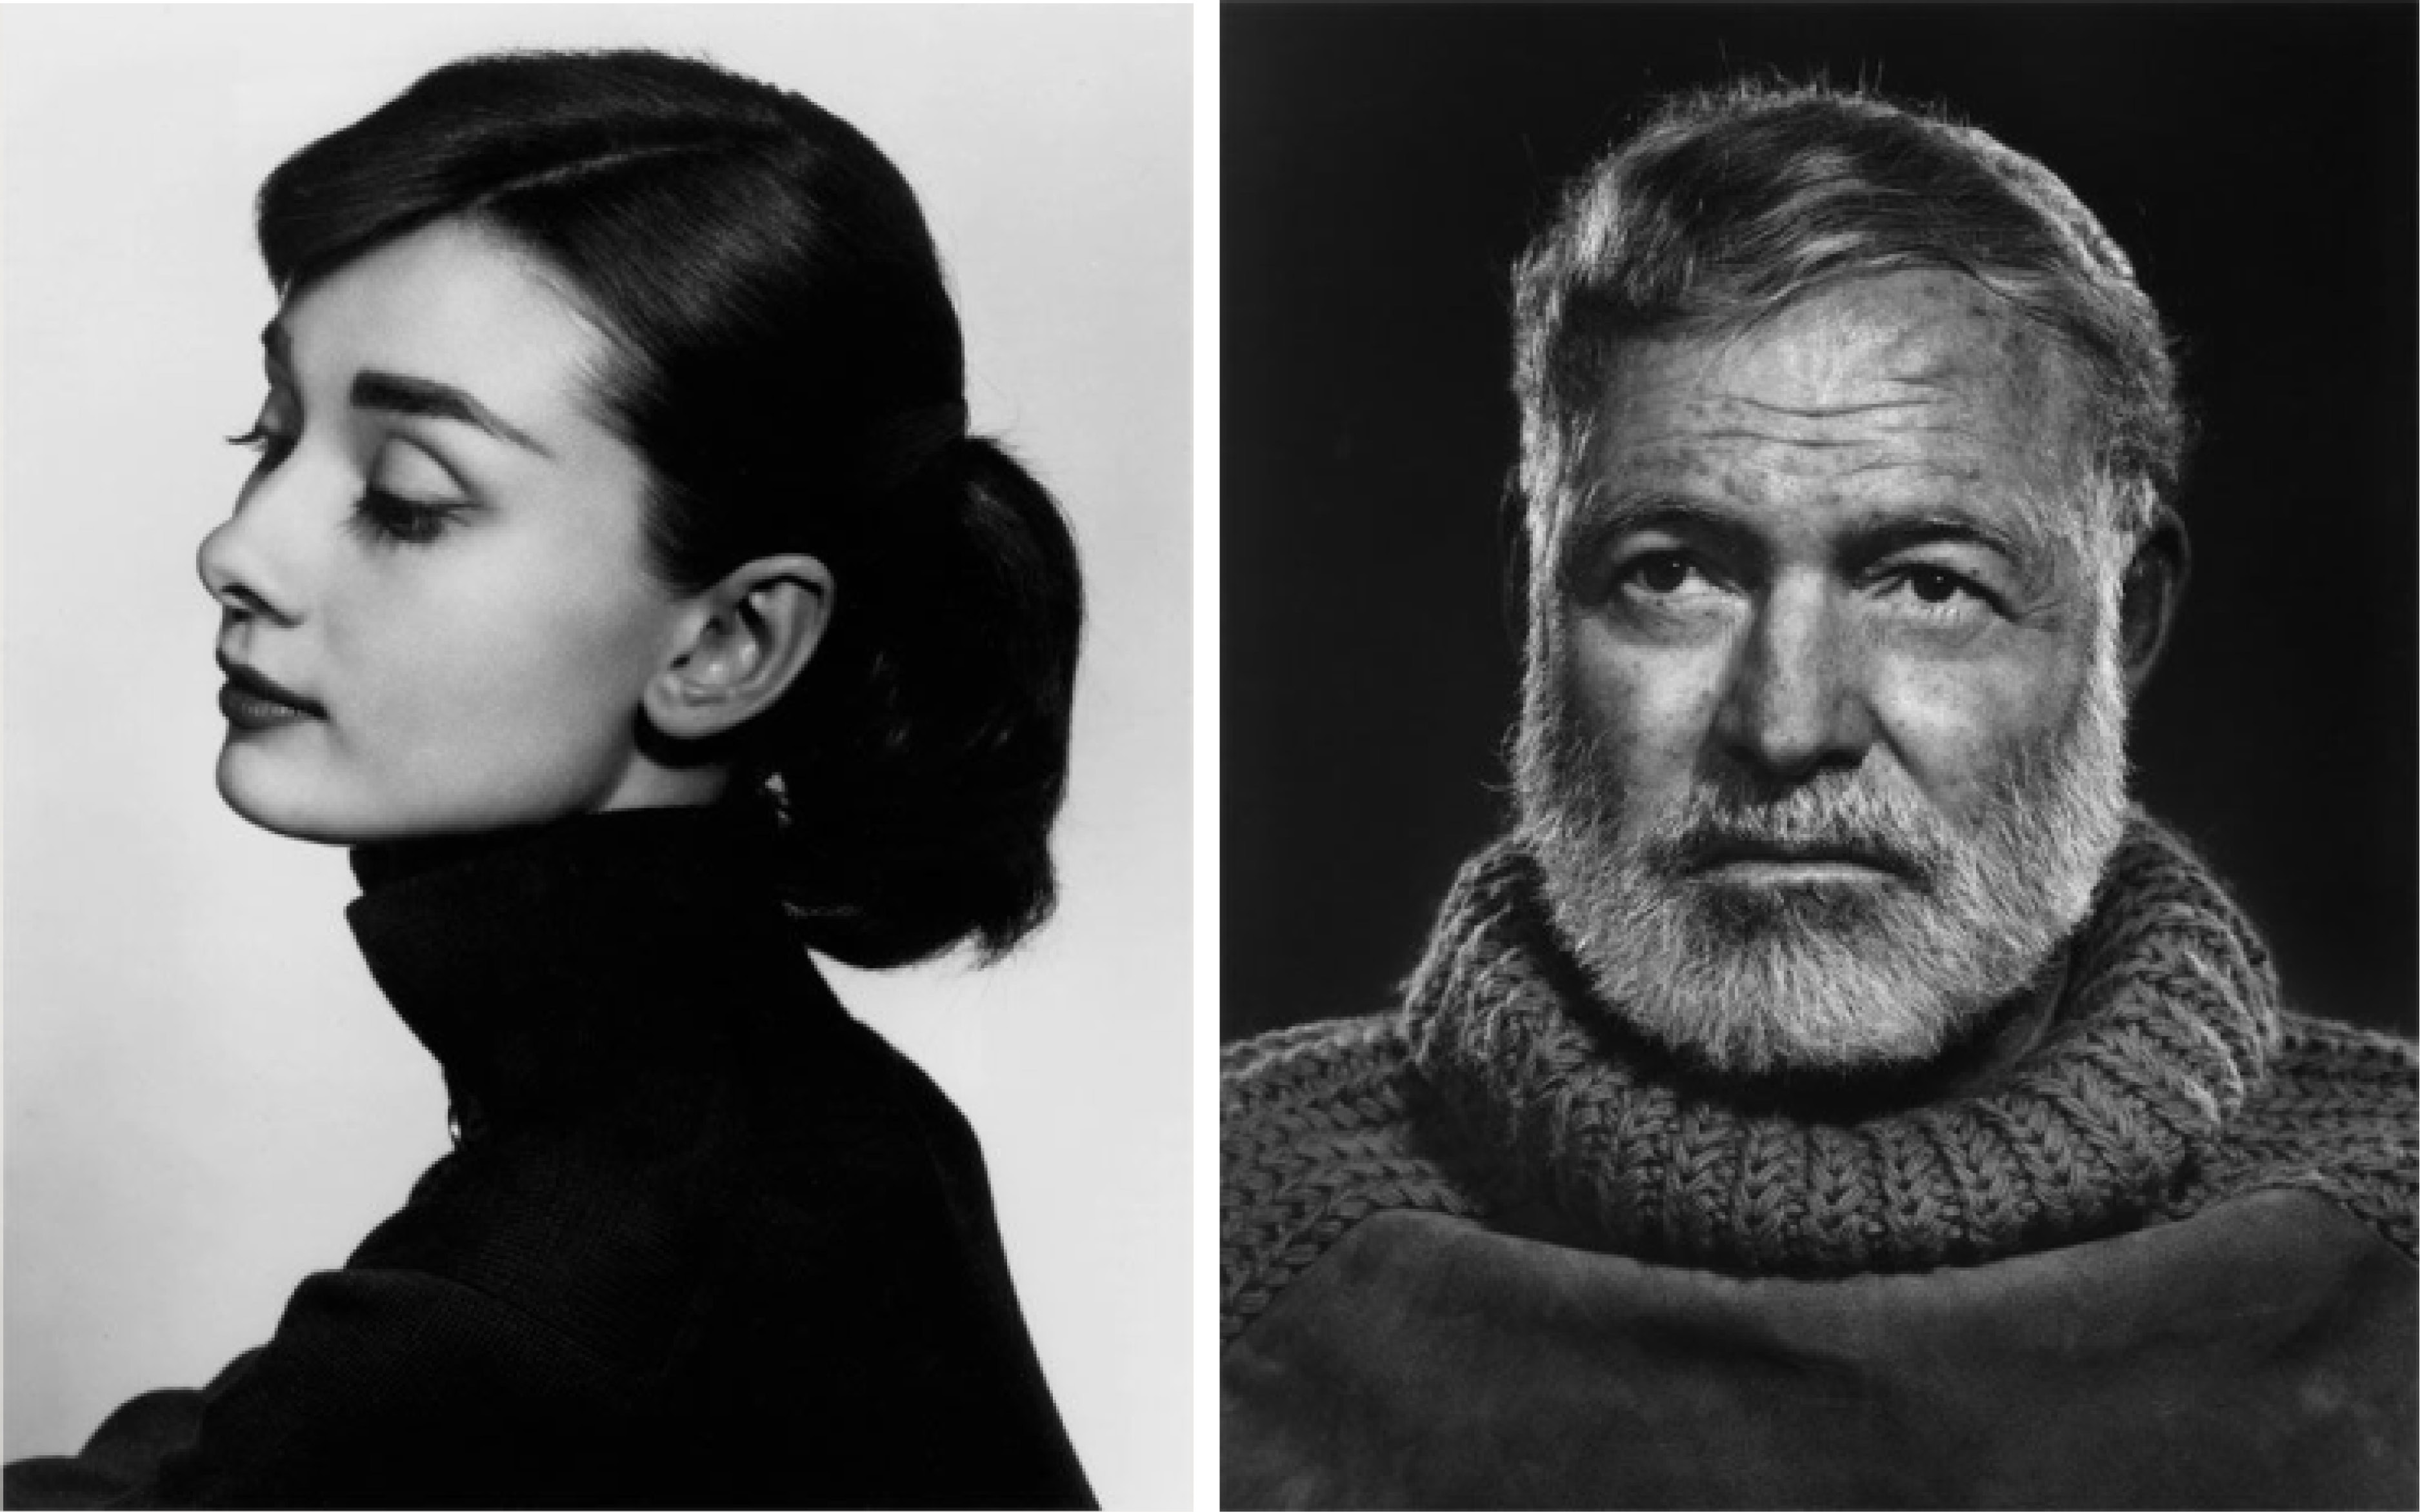 Yousuf Karsh / photographe - Audrey Hepburn